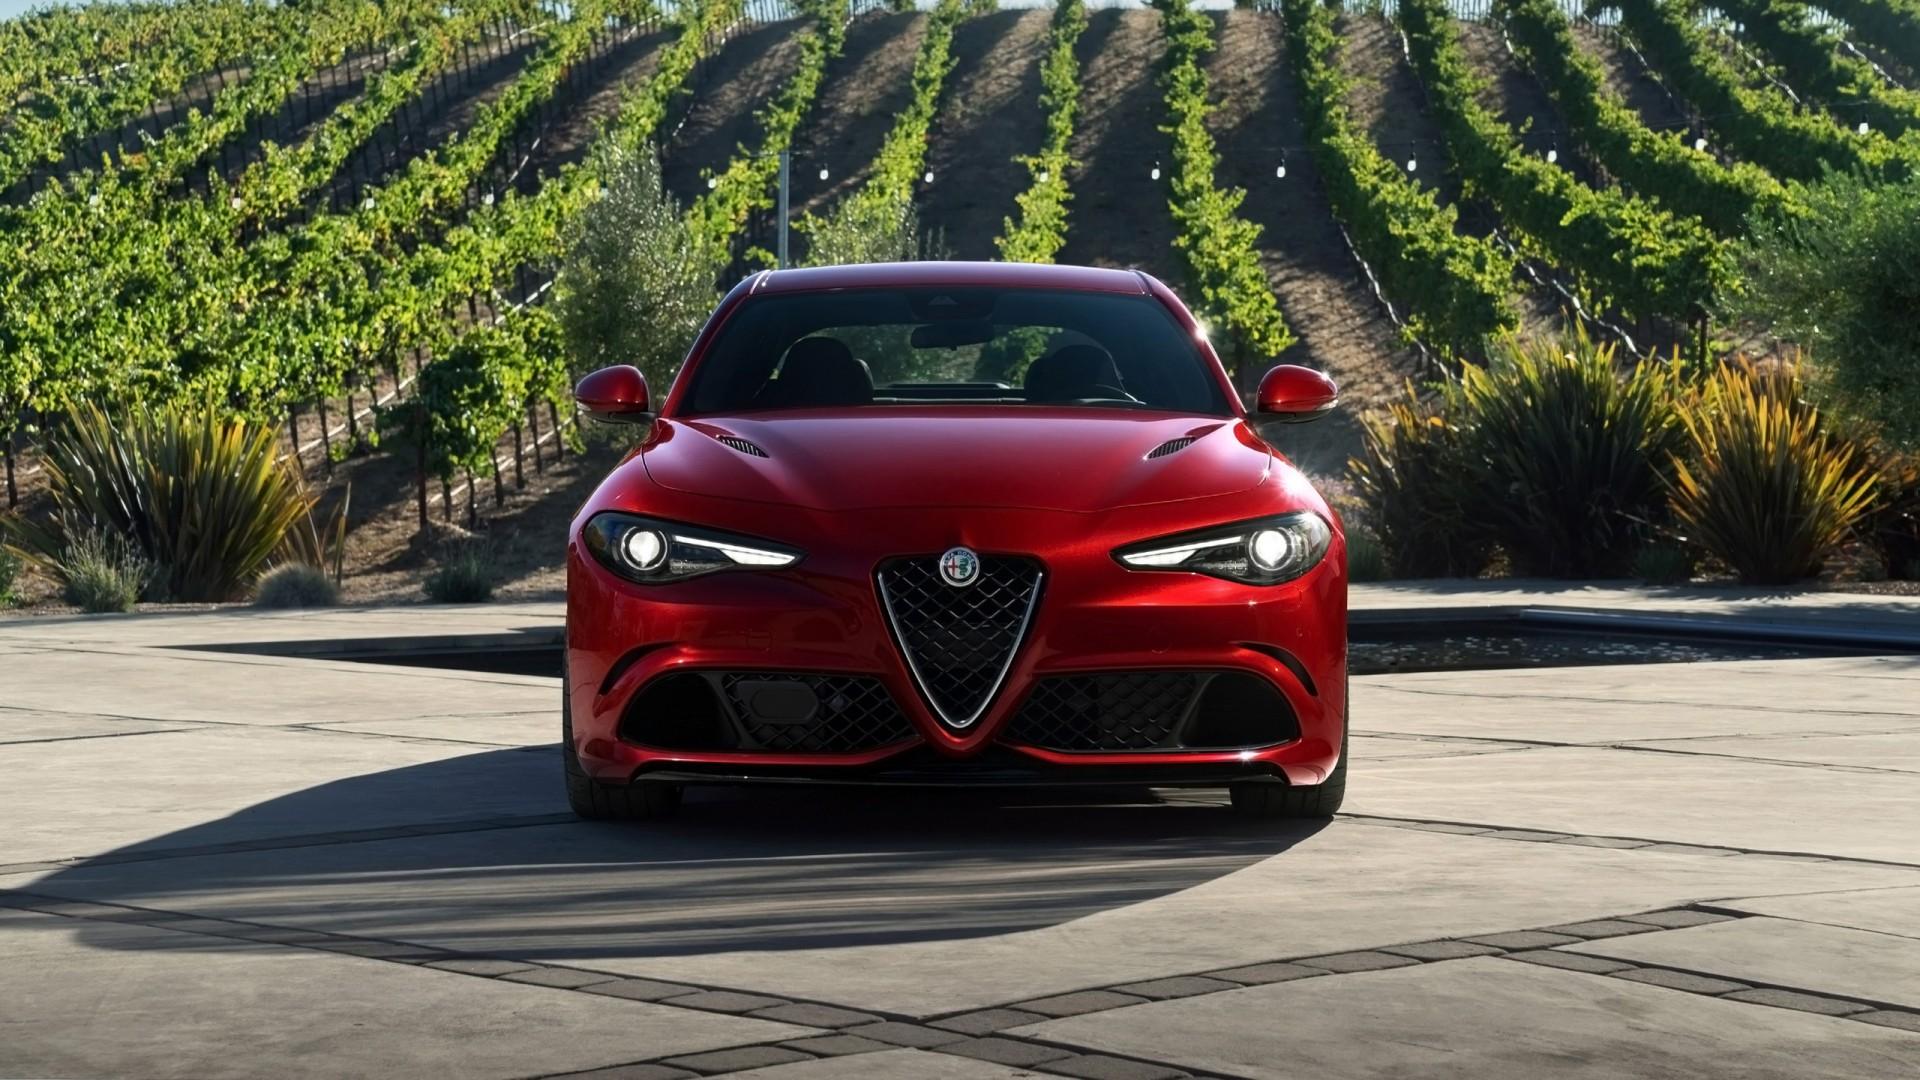 Alfa Romeo Giulia Quadrifoglio X on Alfa Romeo Brera